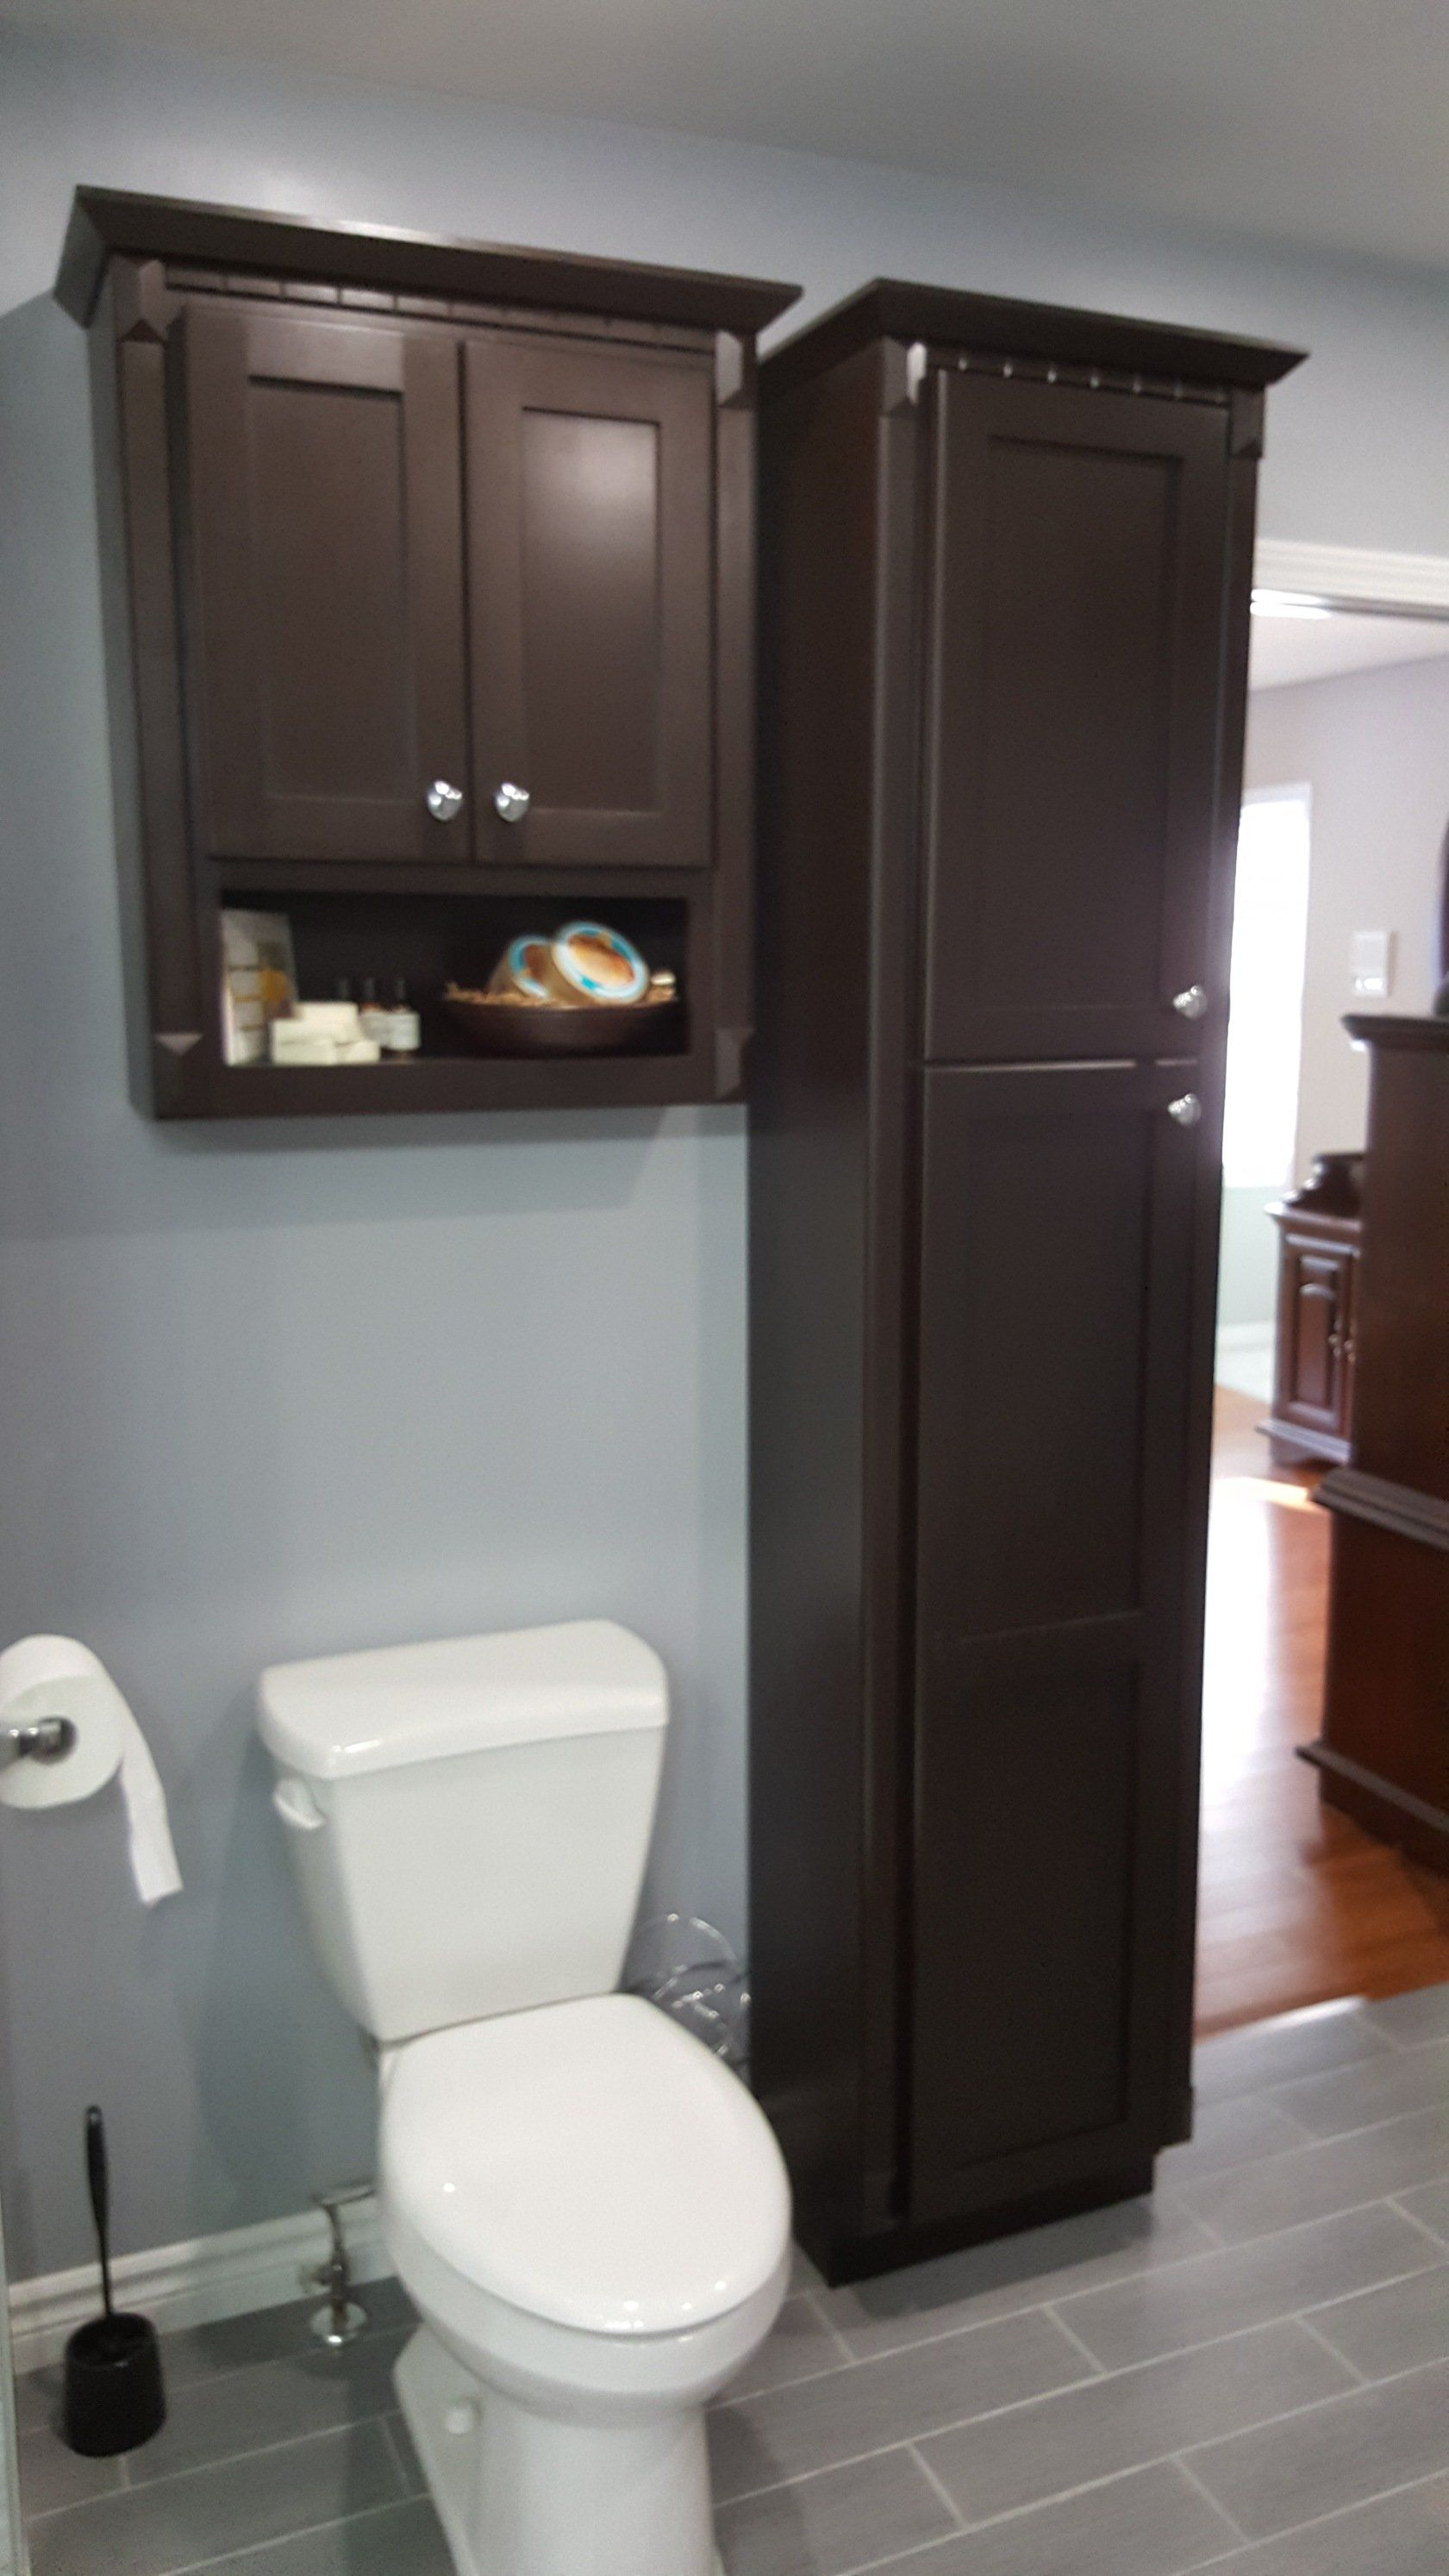 The Sault's Kitchen & Bathroom Renovation Specialist ...